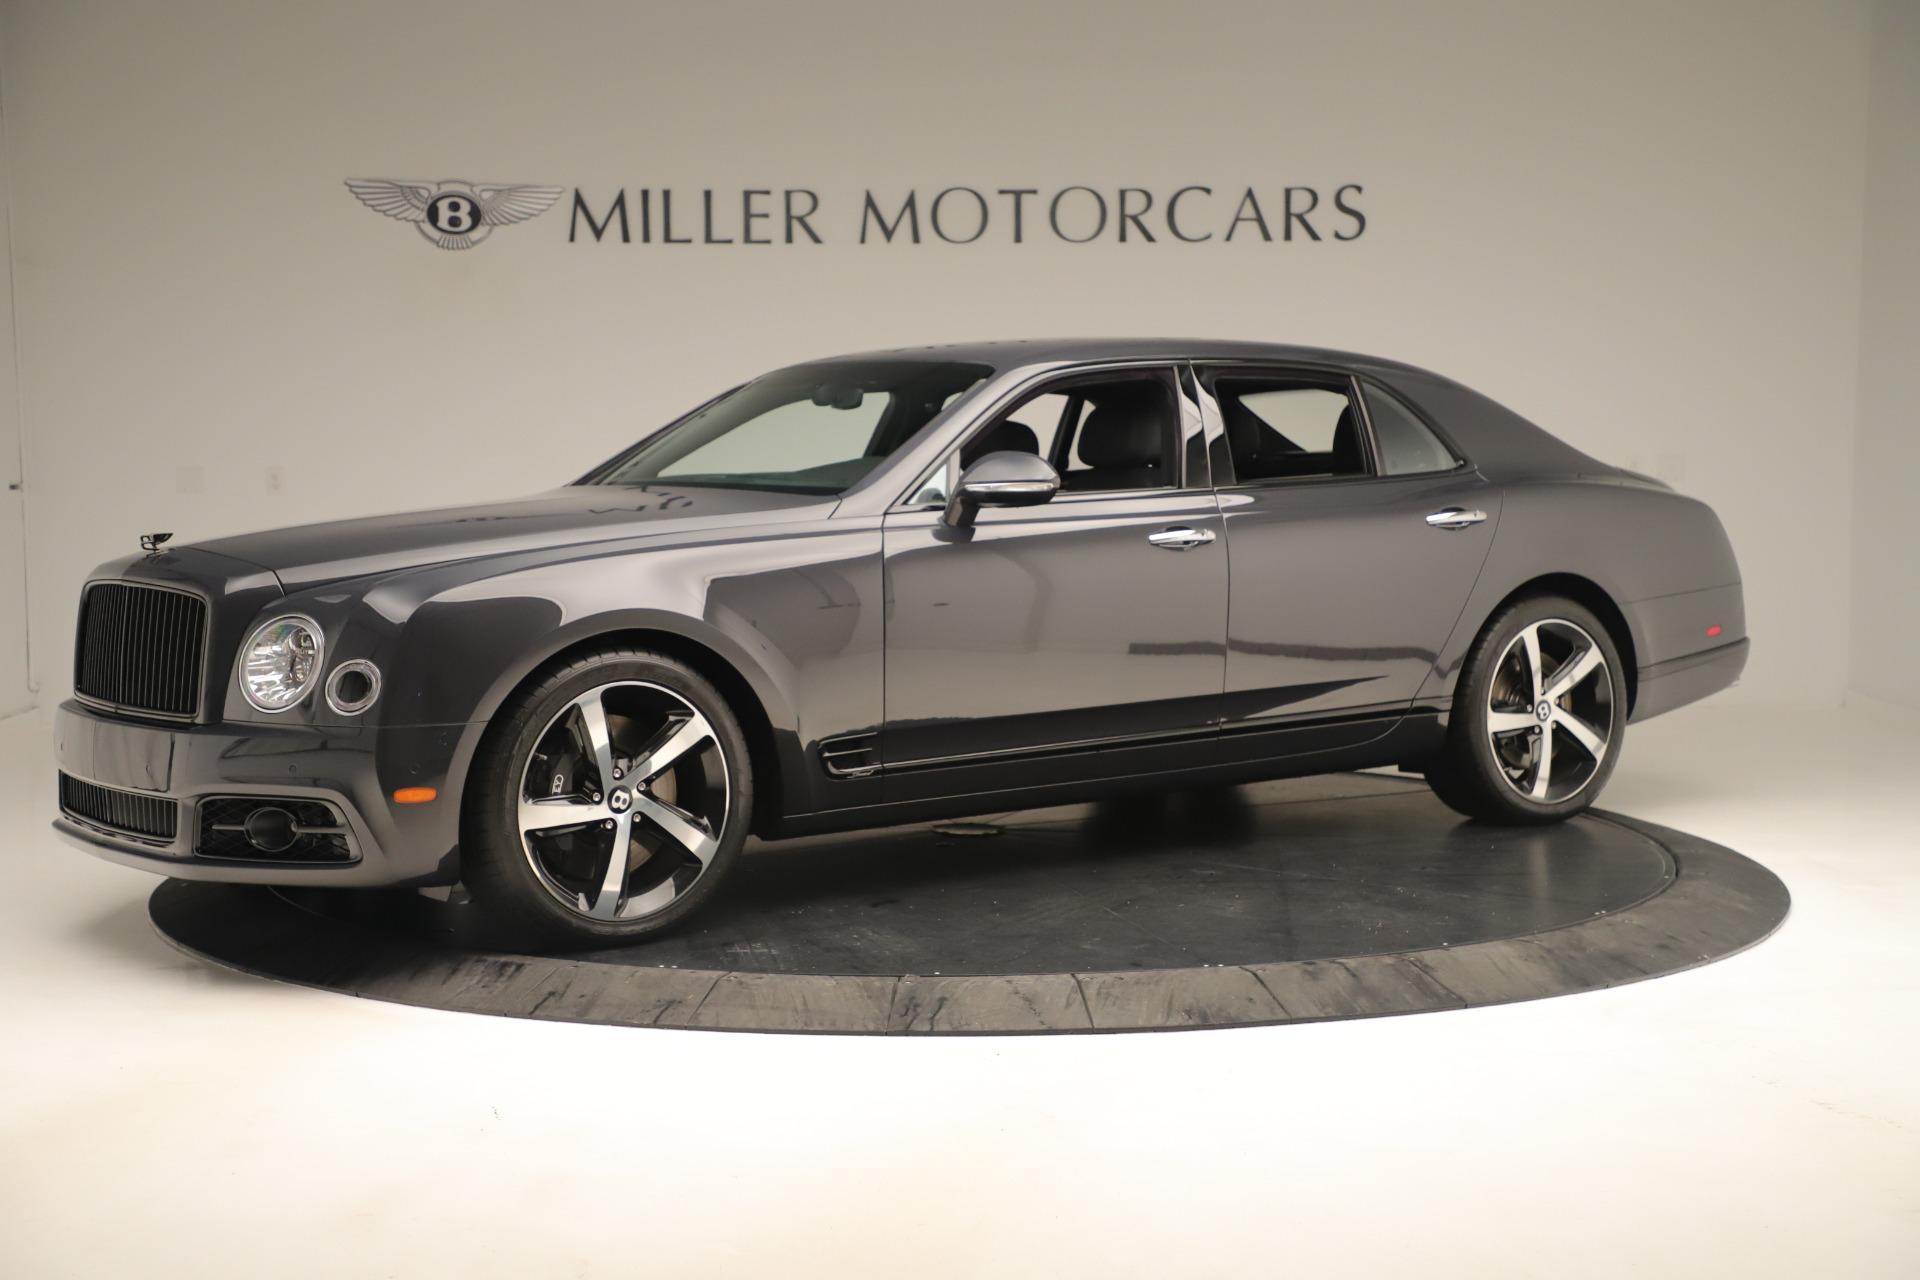 Used 2018 Bentley Mulsanne Speed Design Series For Sale In Westport, CT 3405_p2